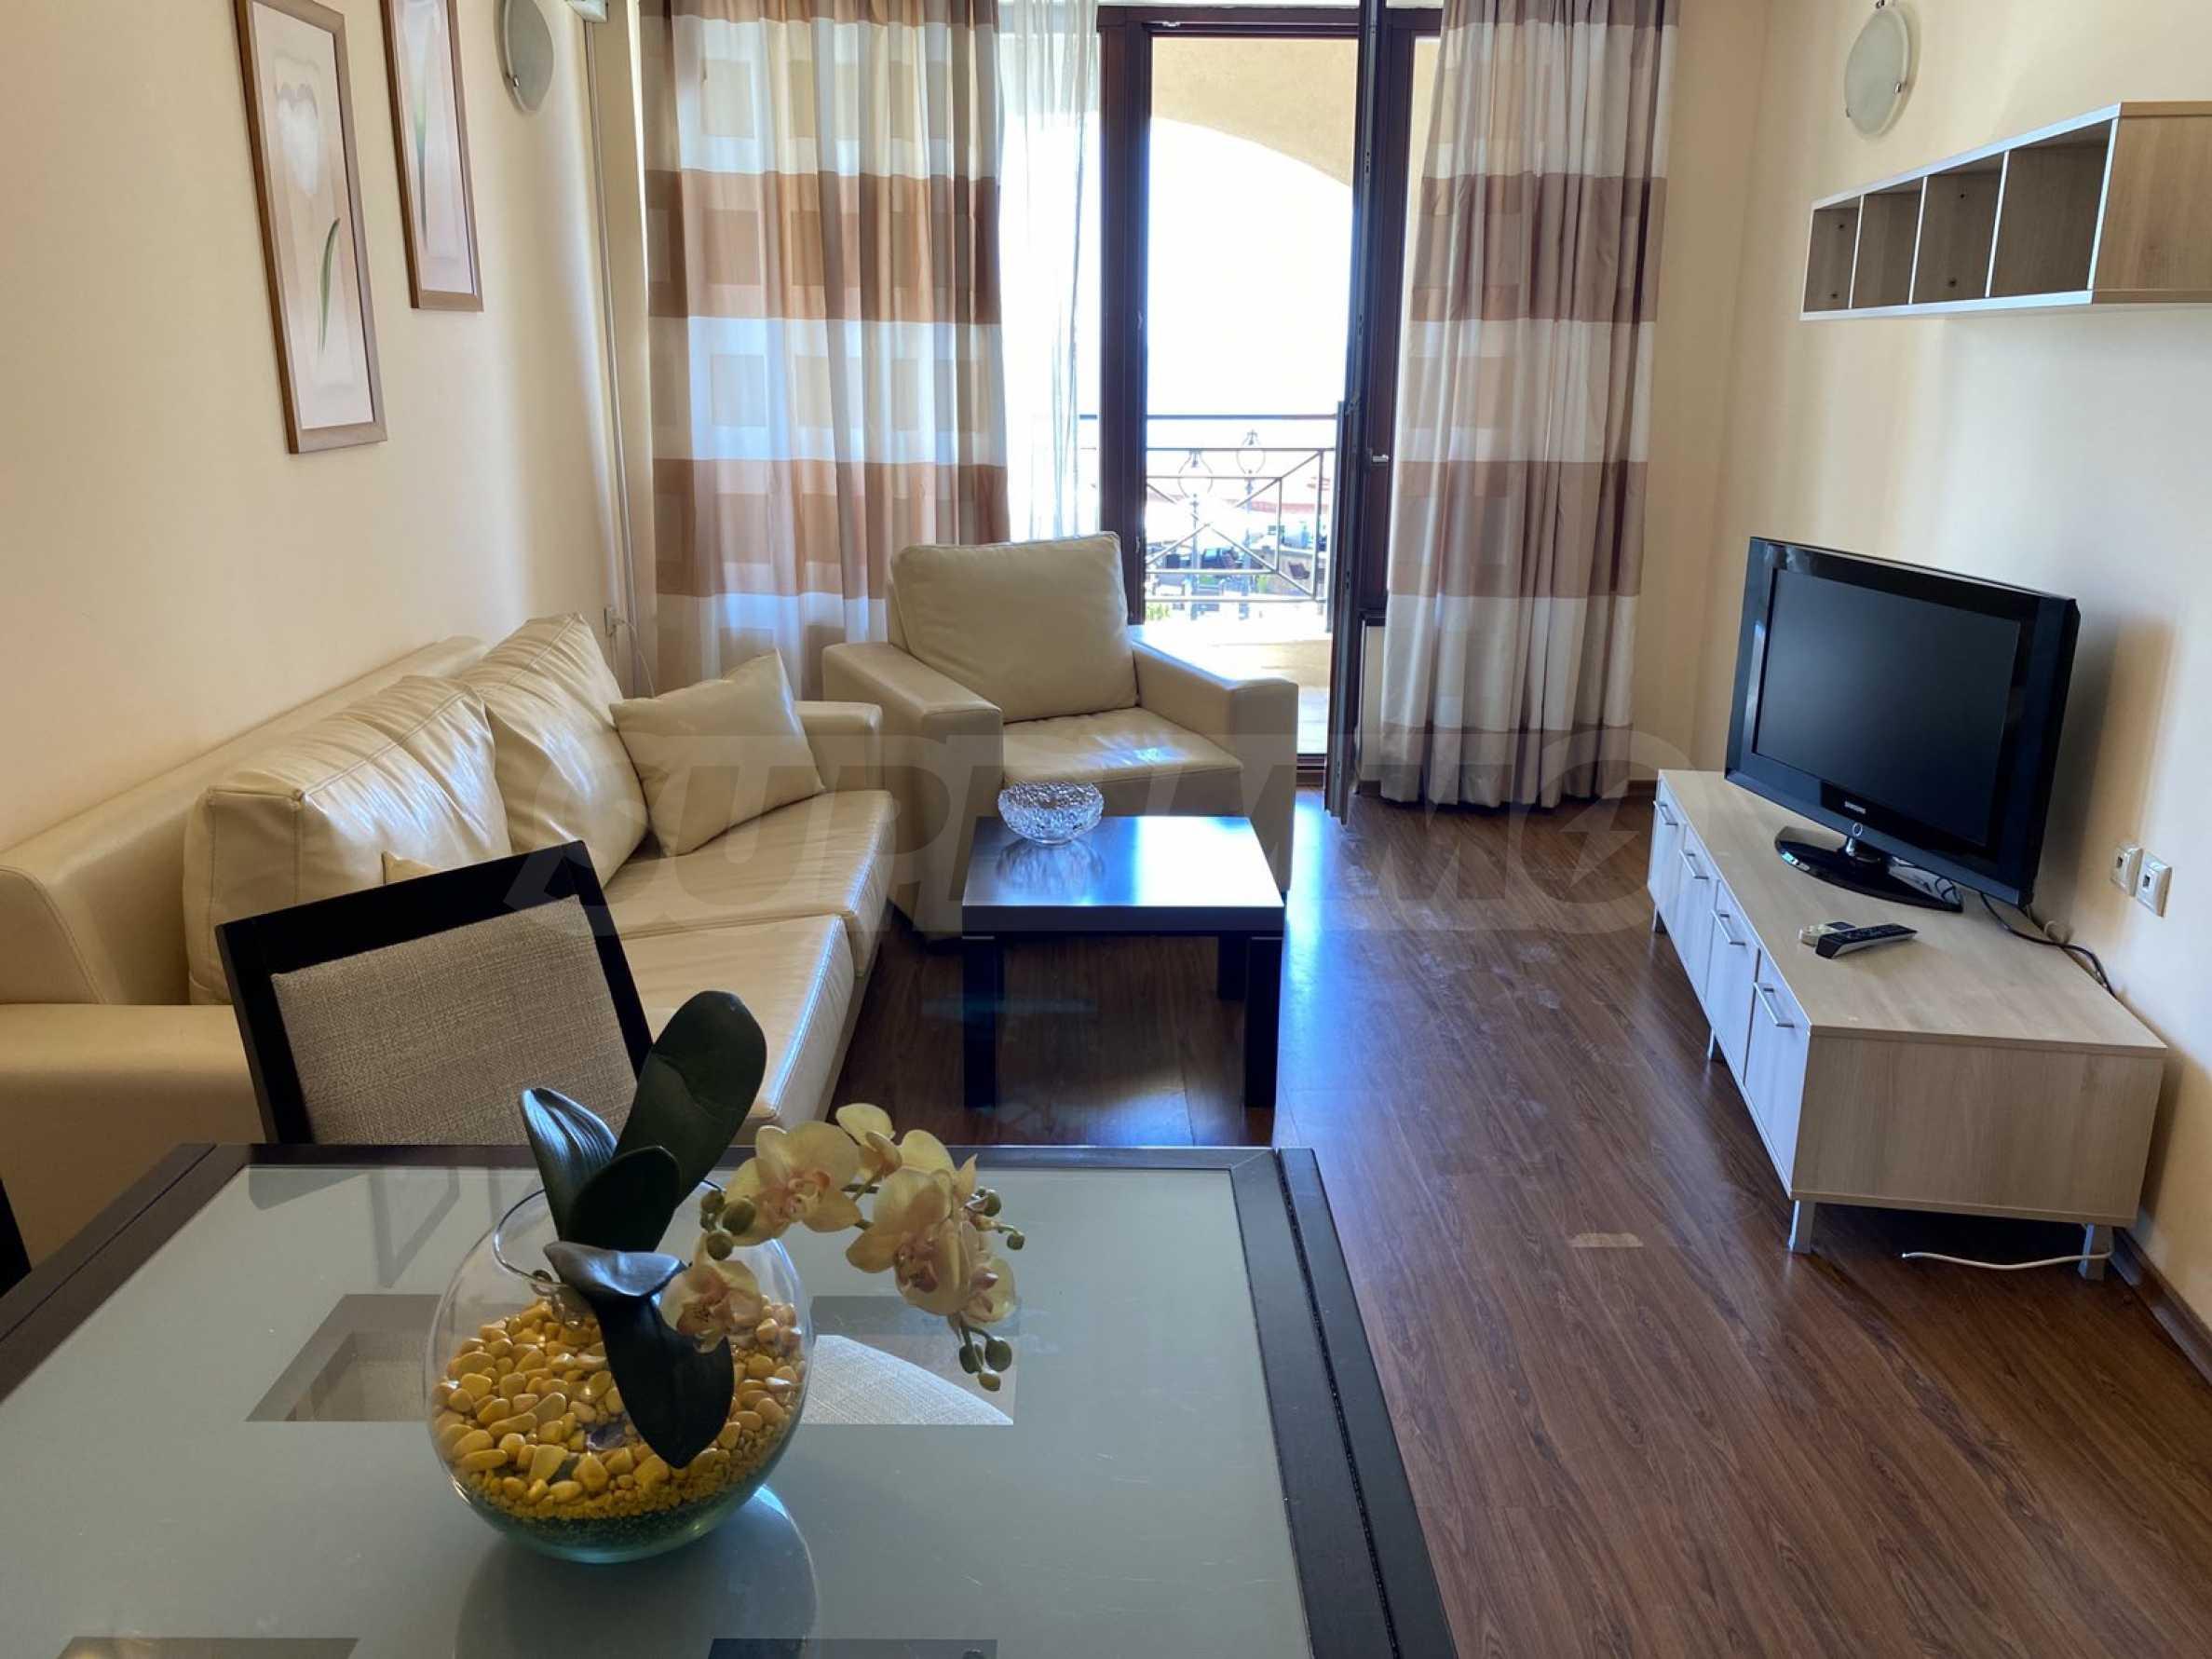 1-bedroom apartment Duralek  6